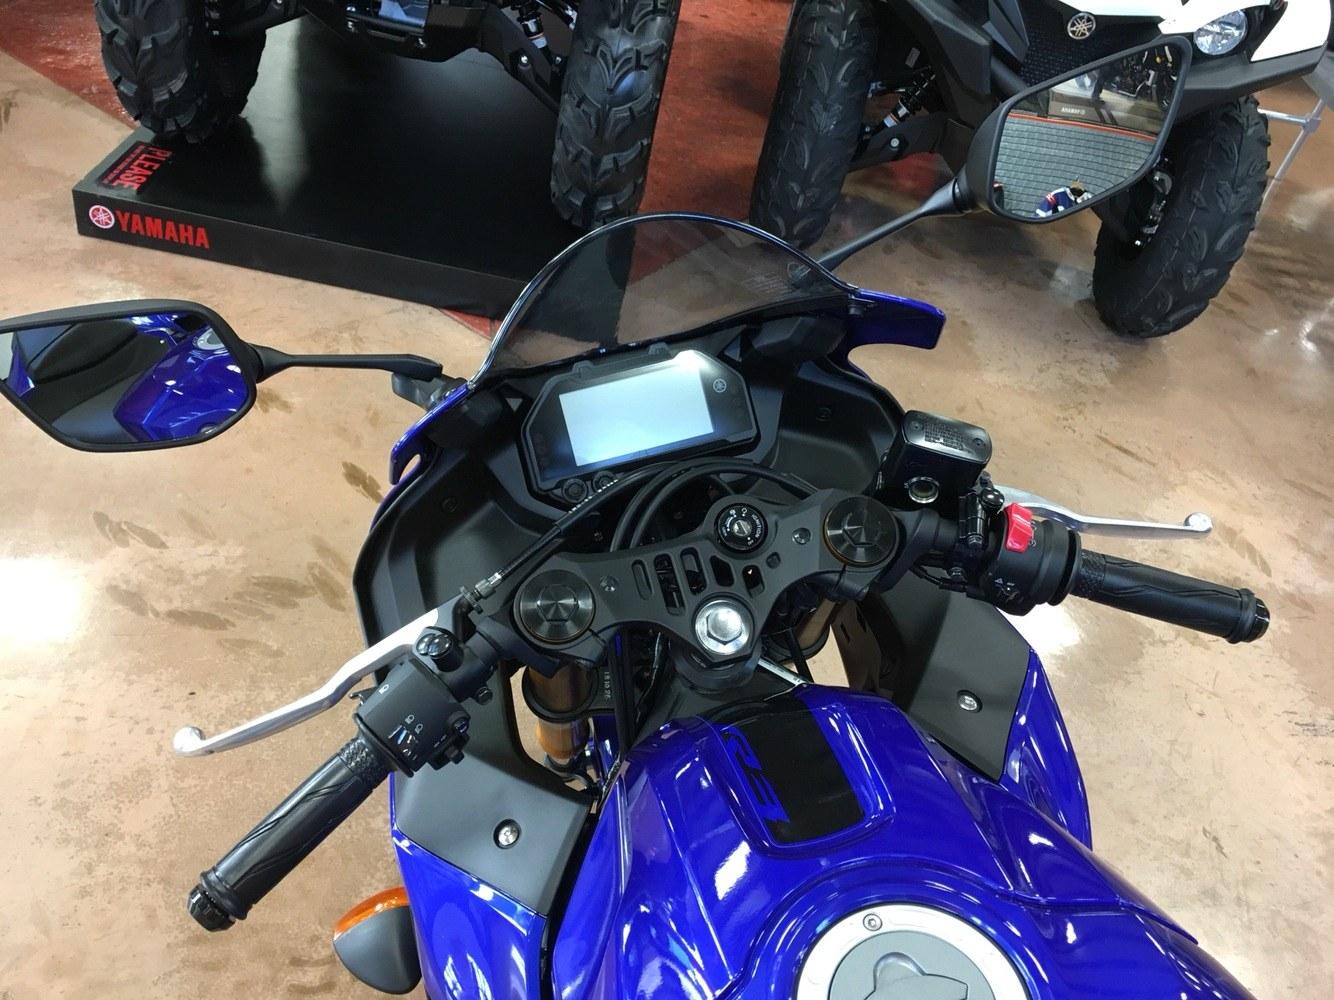 2019 Yamaha YZF-R3 11